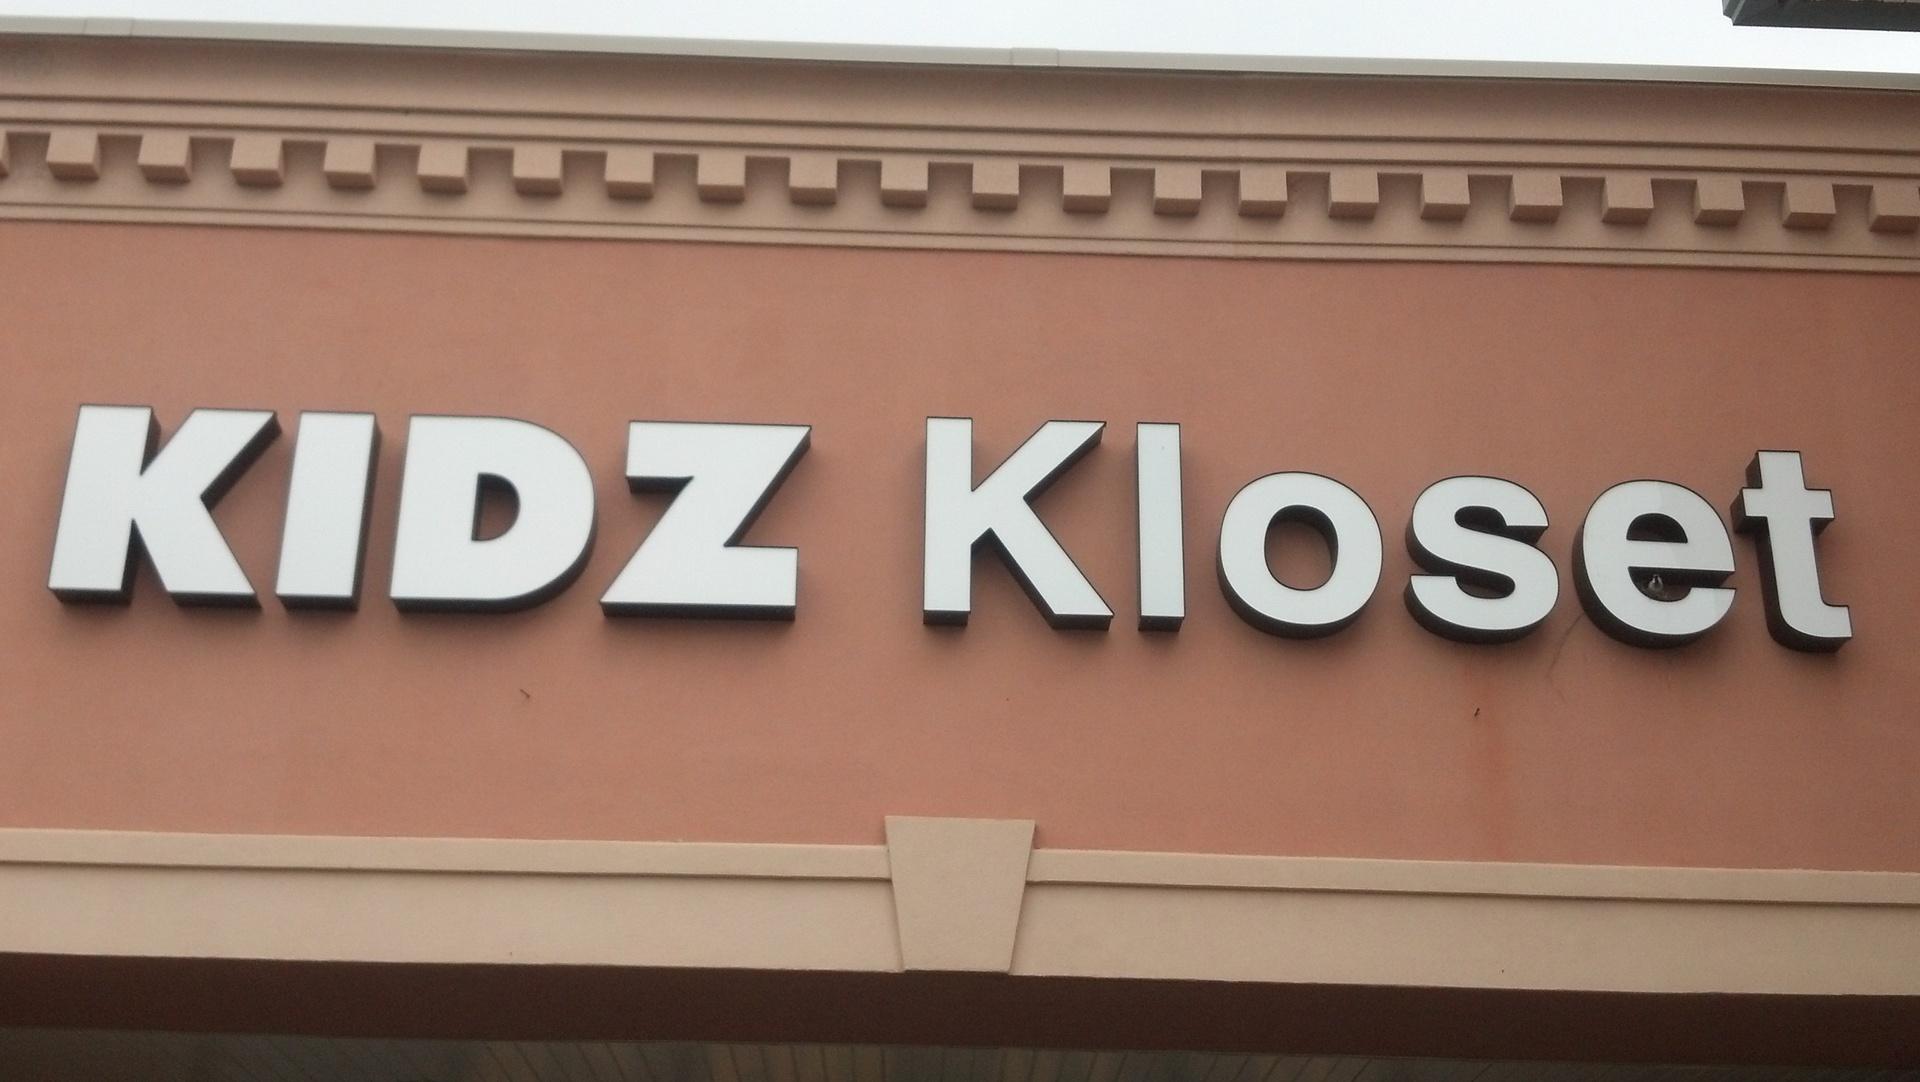 Kidz Kloset, 9949 Redick Circle, Omaha, NE, 68122, United States